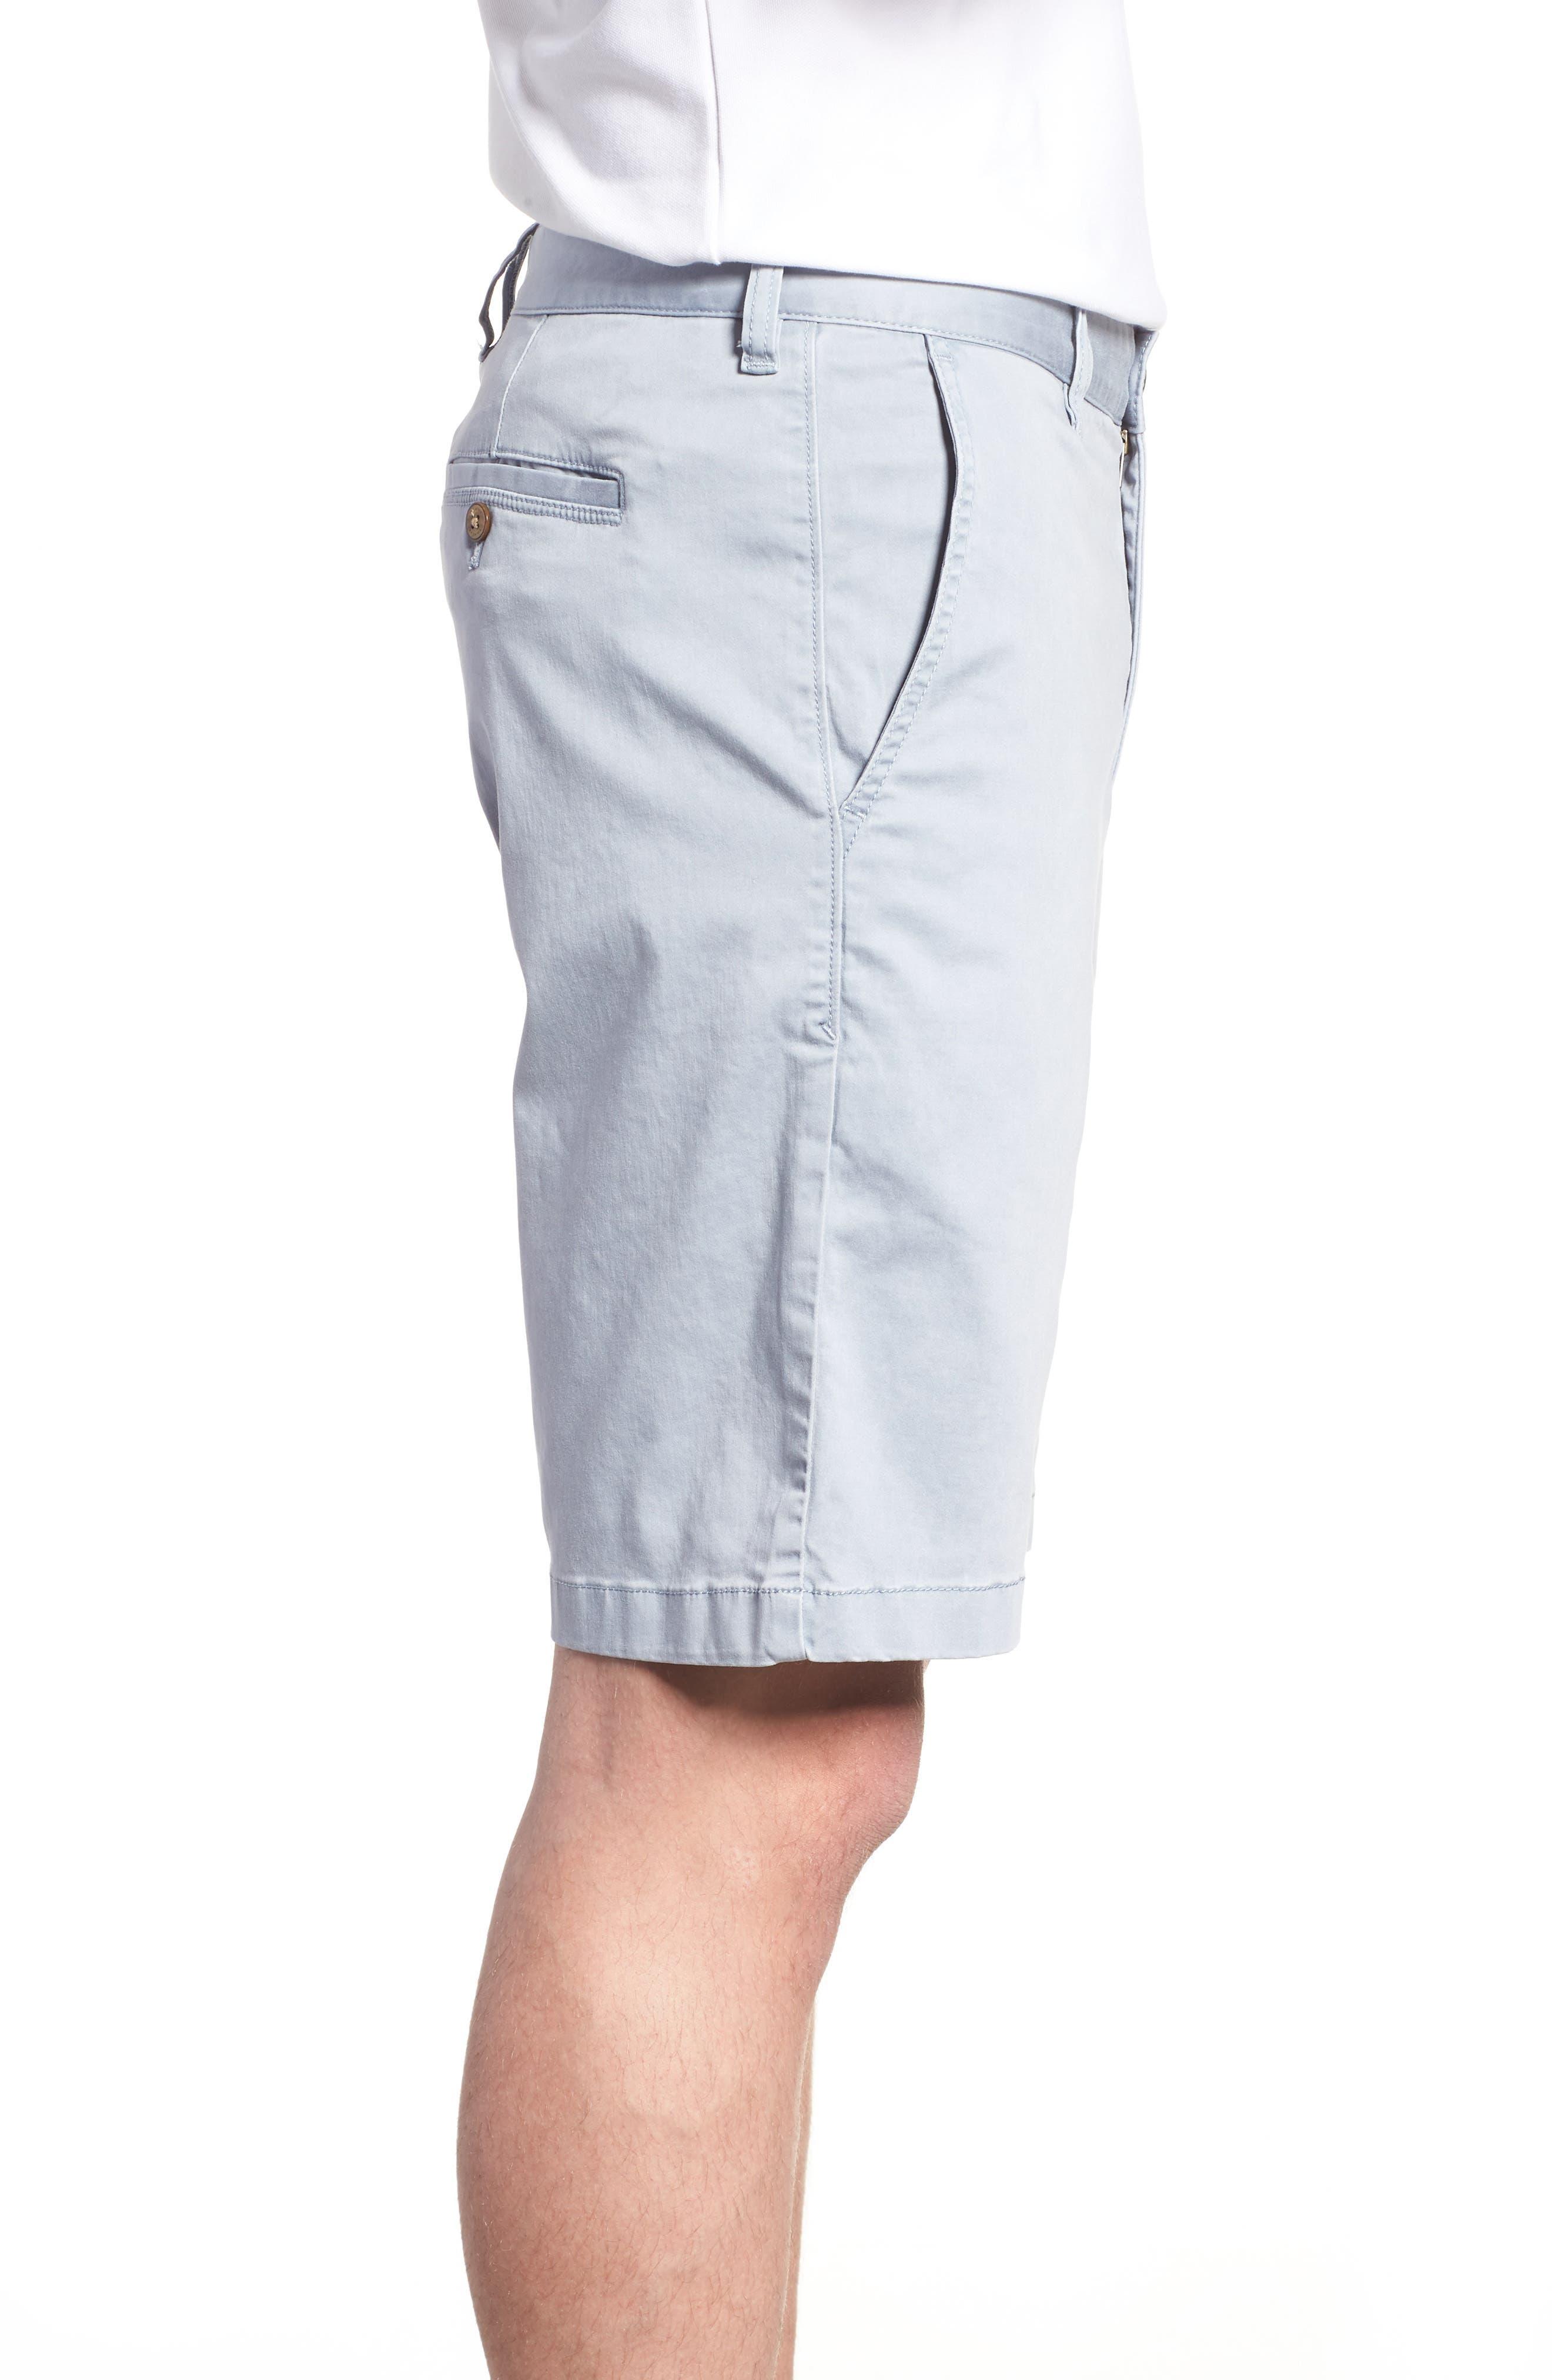 Boracay Chino Shorts,                             Alternate thumbnail 22, color,